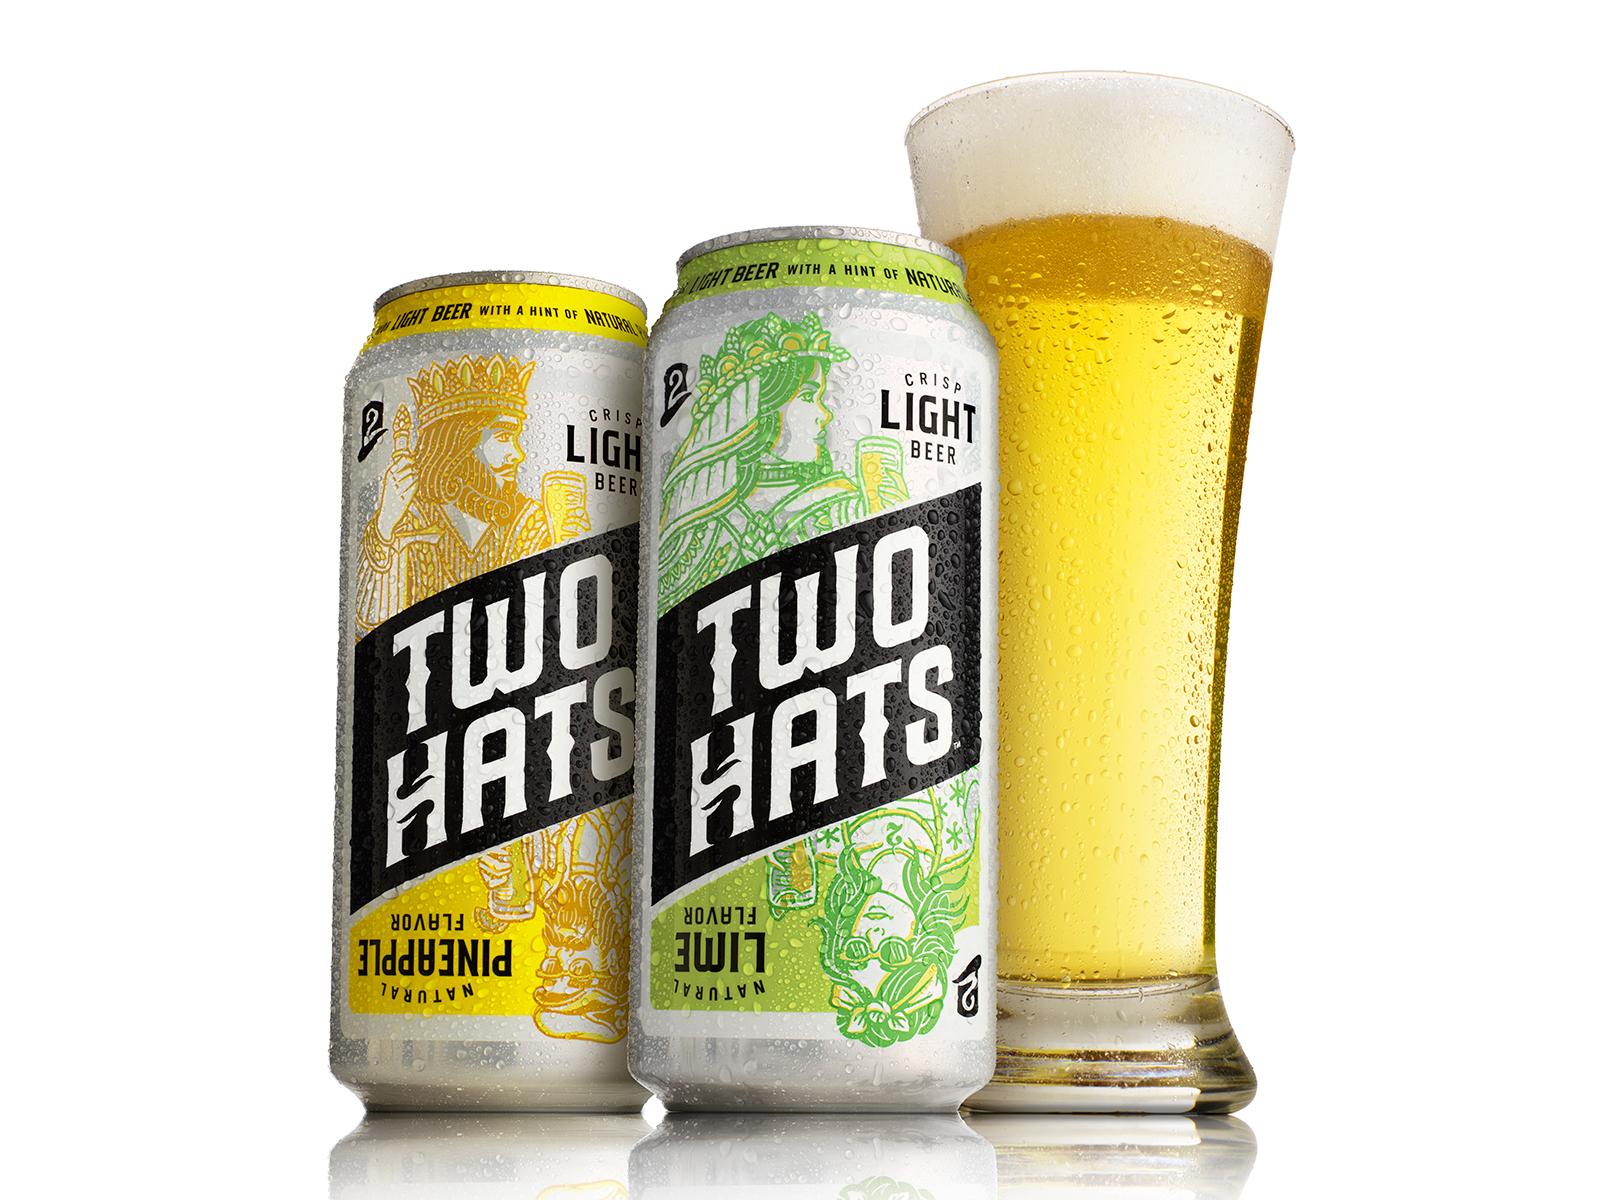 MillerCoors Launches Cheap, Fruit-Flavored Light Beer for Millennials